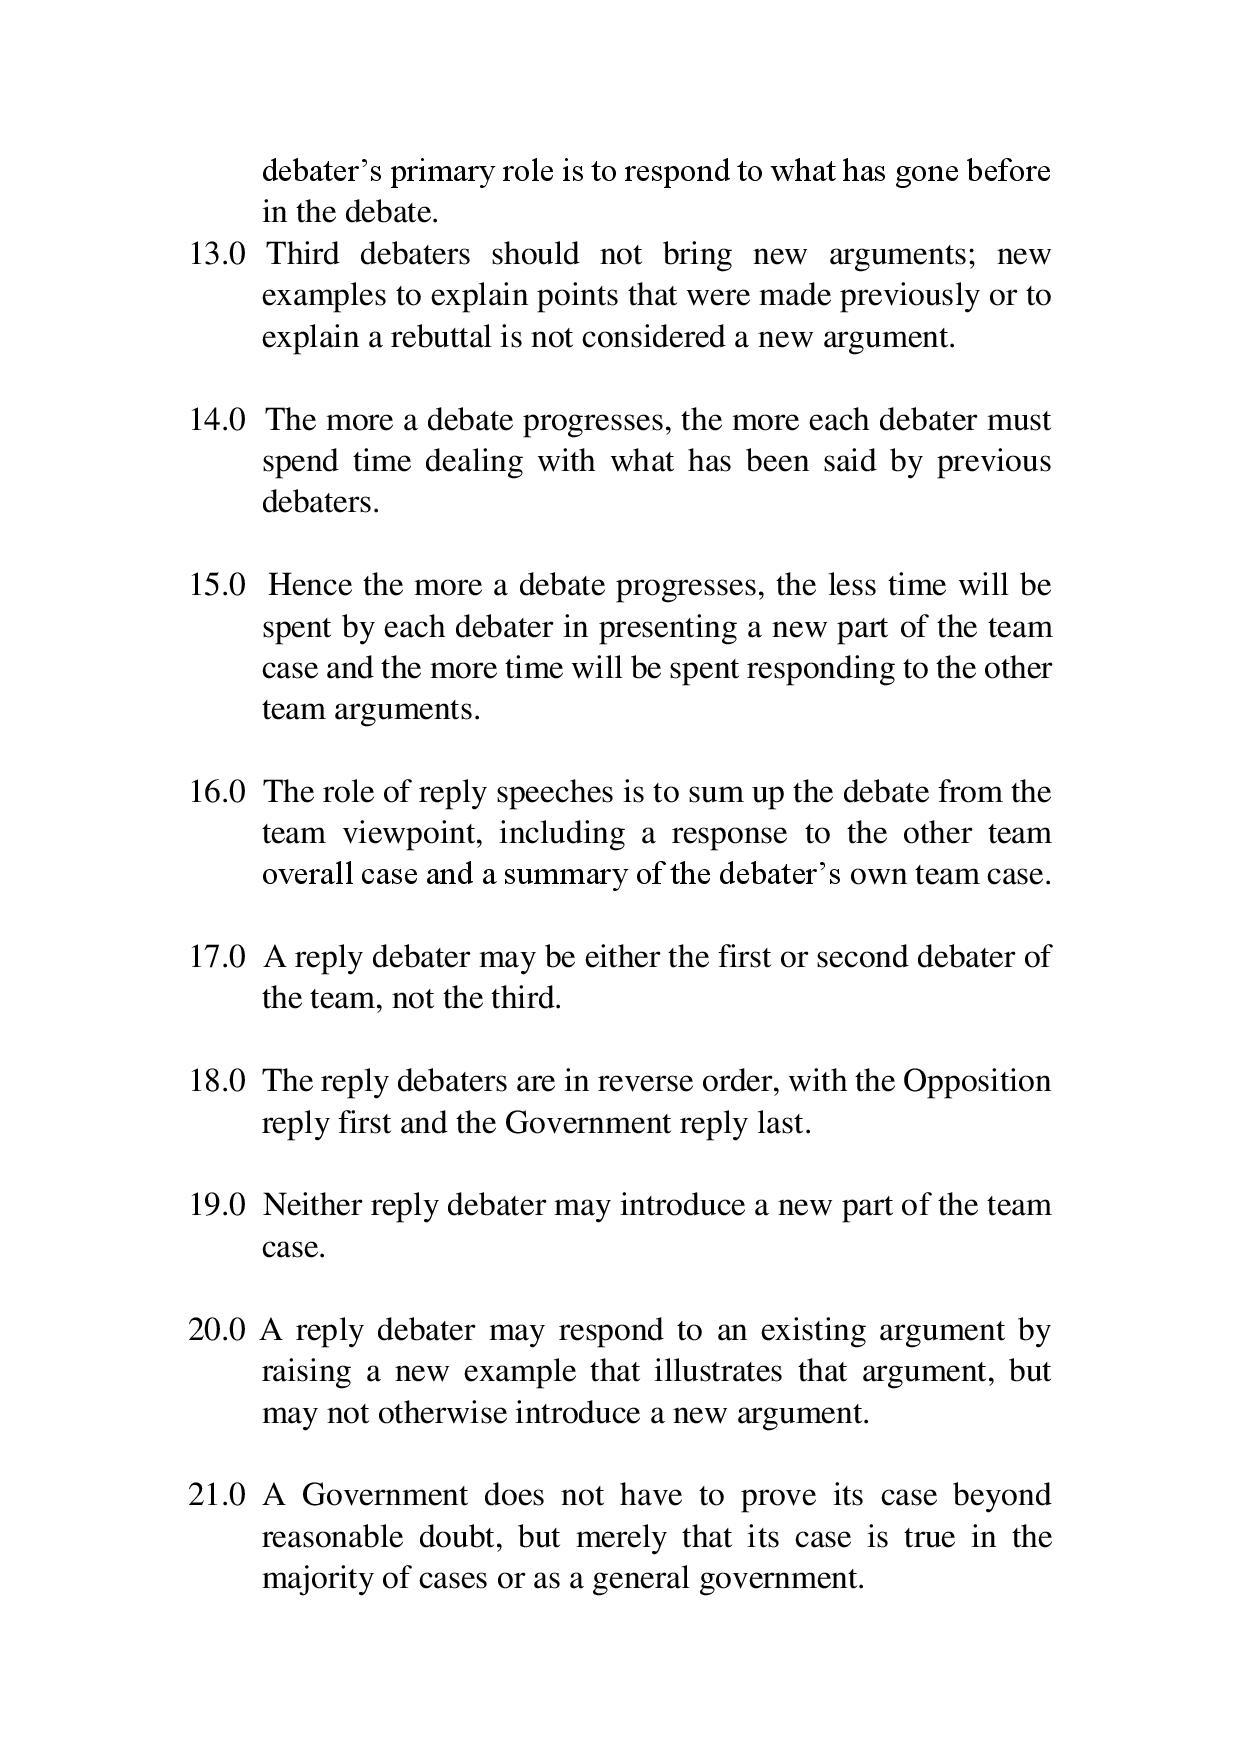 MALAYSIAN DENTAL INTERVARSITY DEBATE COMPETITION (Edited)-page-017.jpg